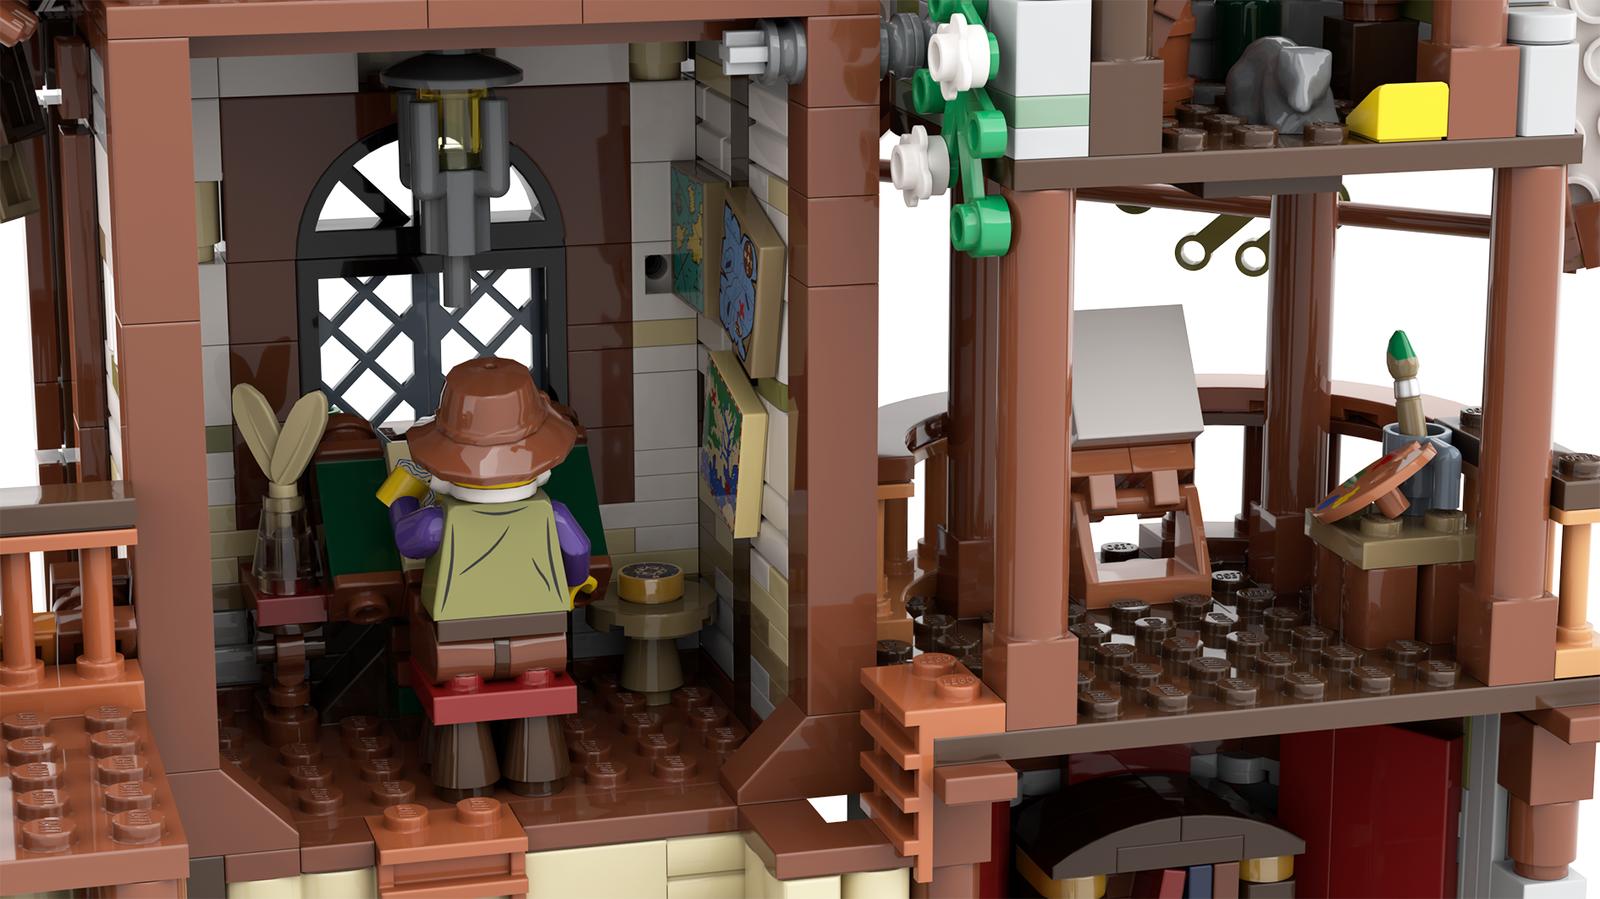 lego-ideas-the-mountain-windmill-hanwasyellowfirst-5 zusammengebaut.com